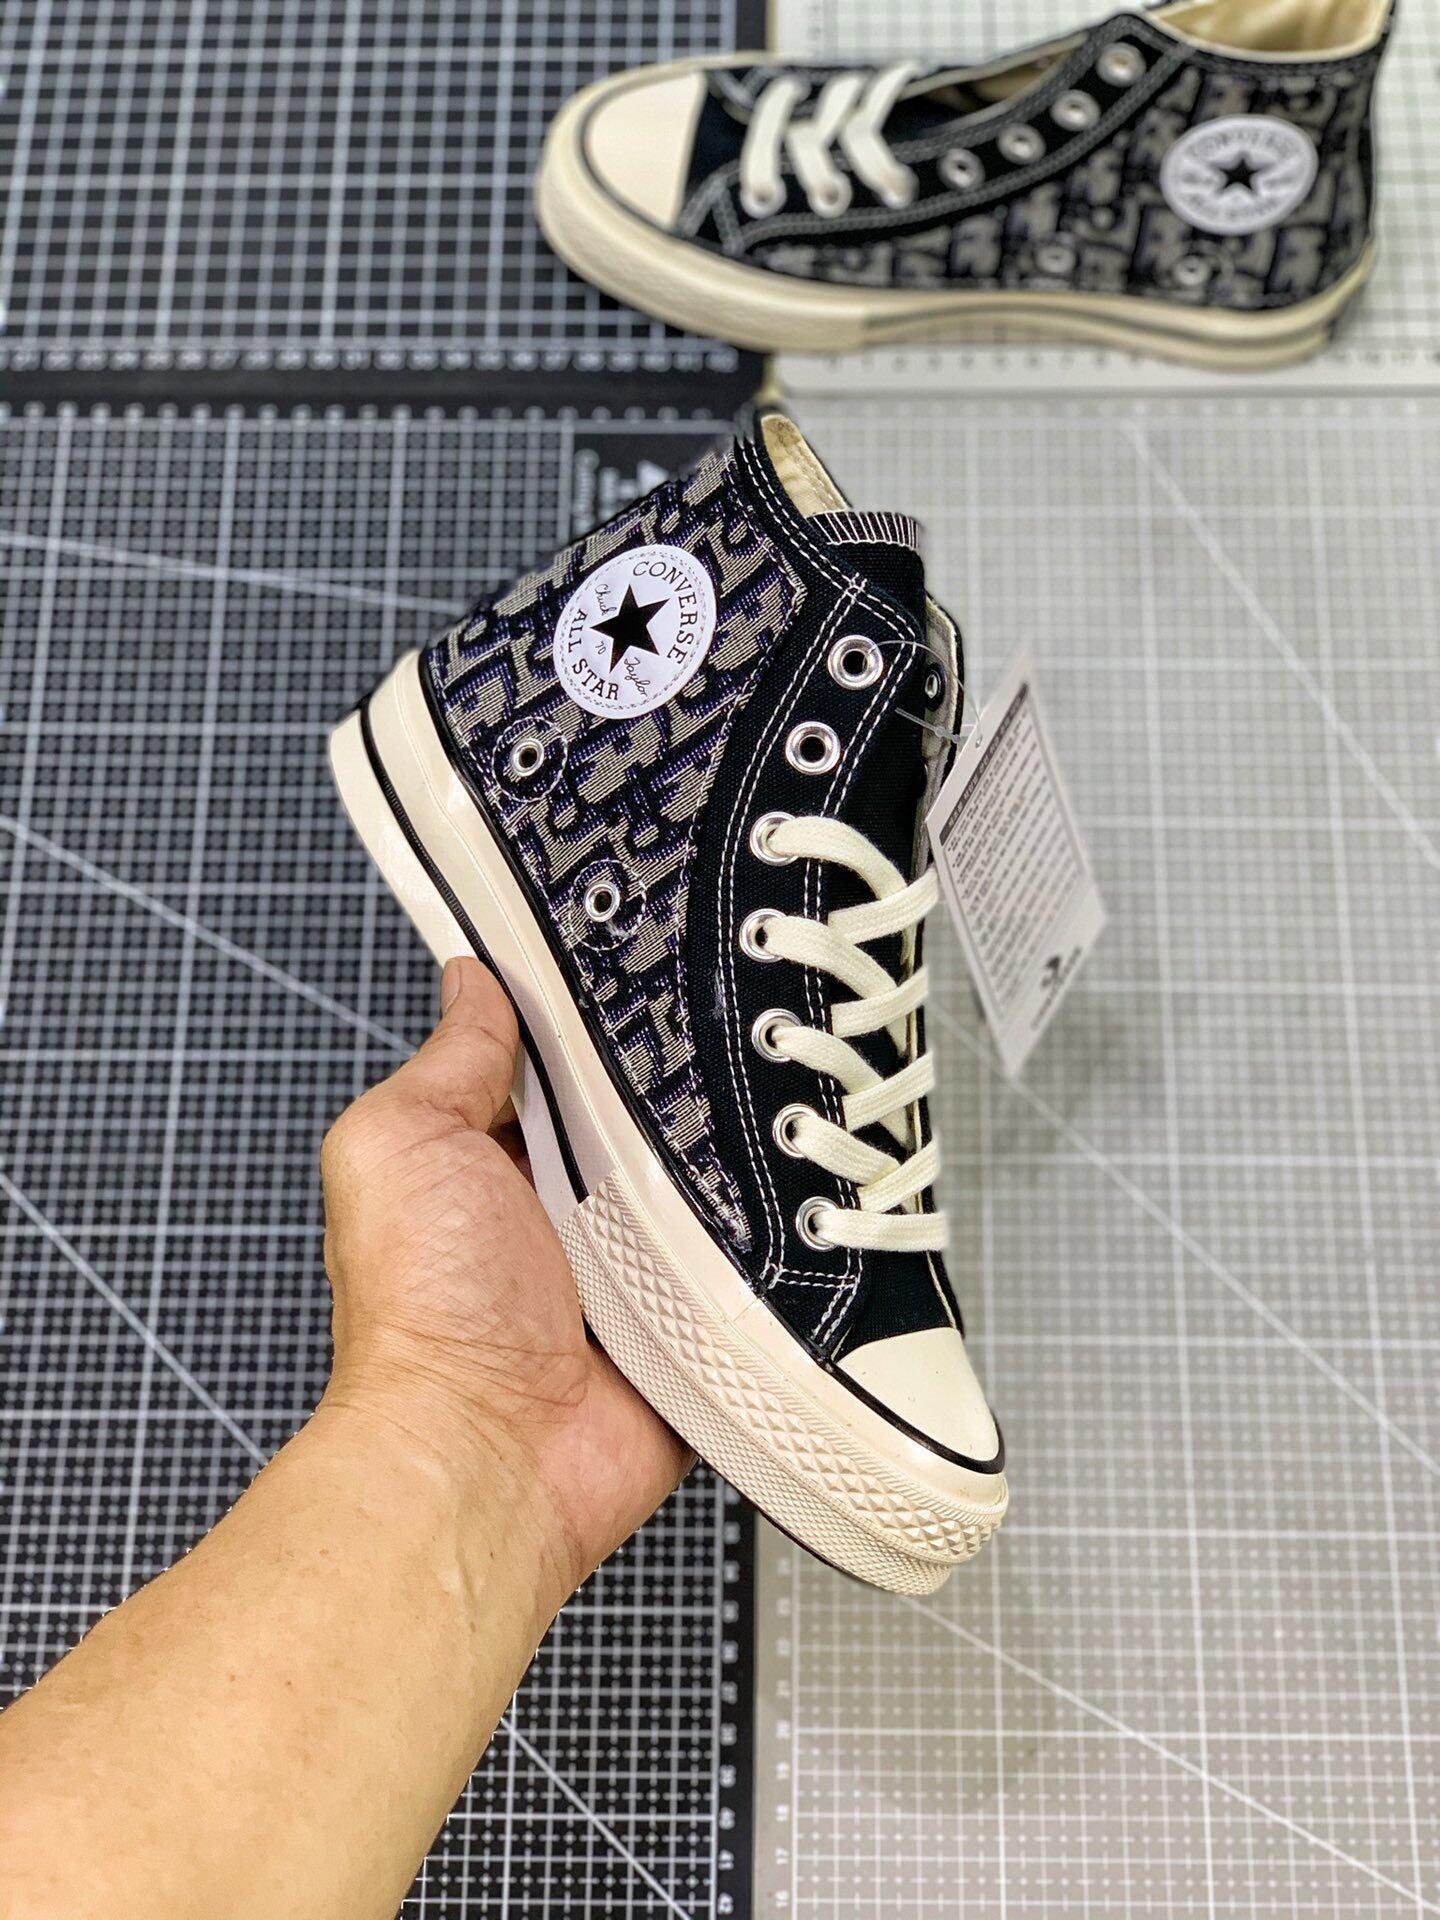 Dior x Converse Chuck Taylor All Star